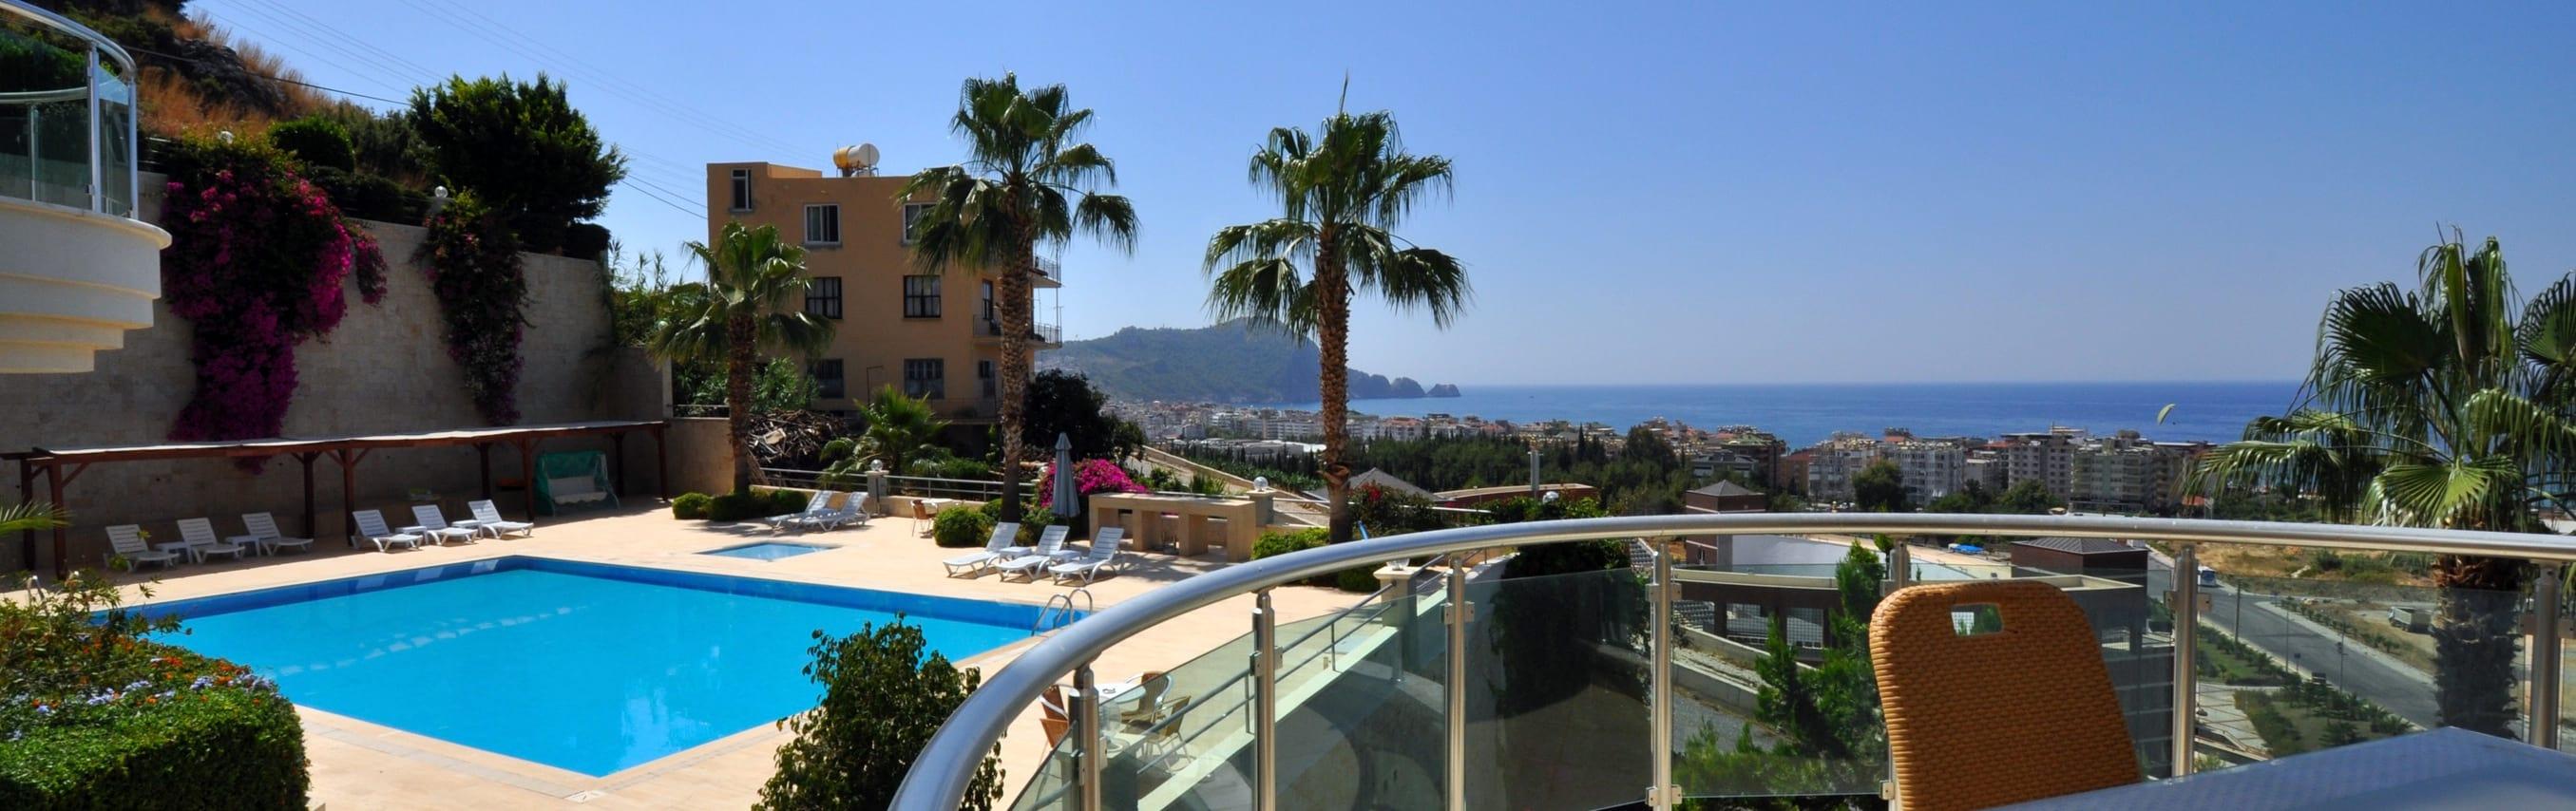 Cleopatra castle view